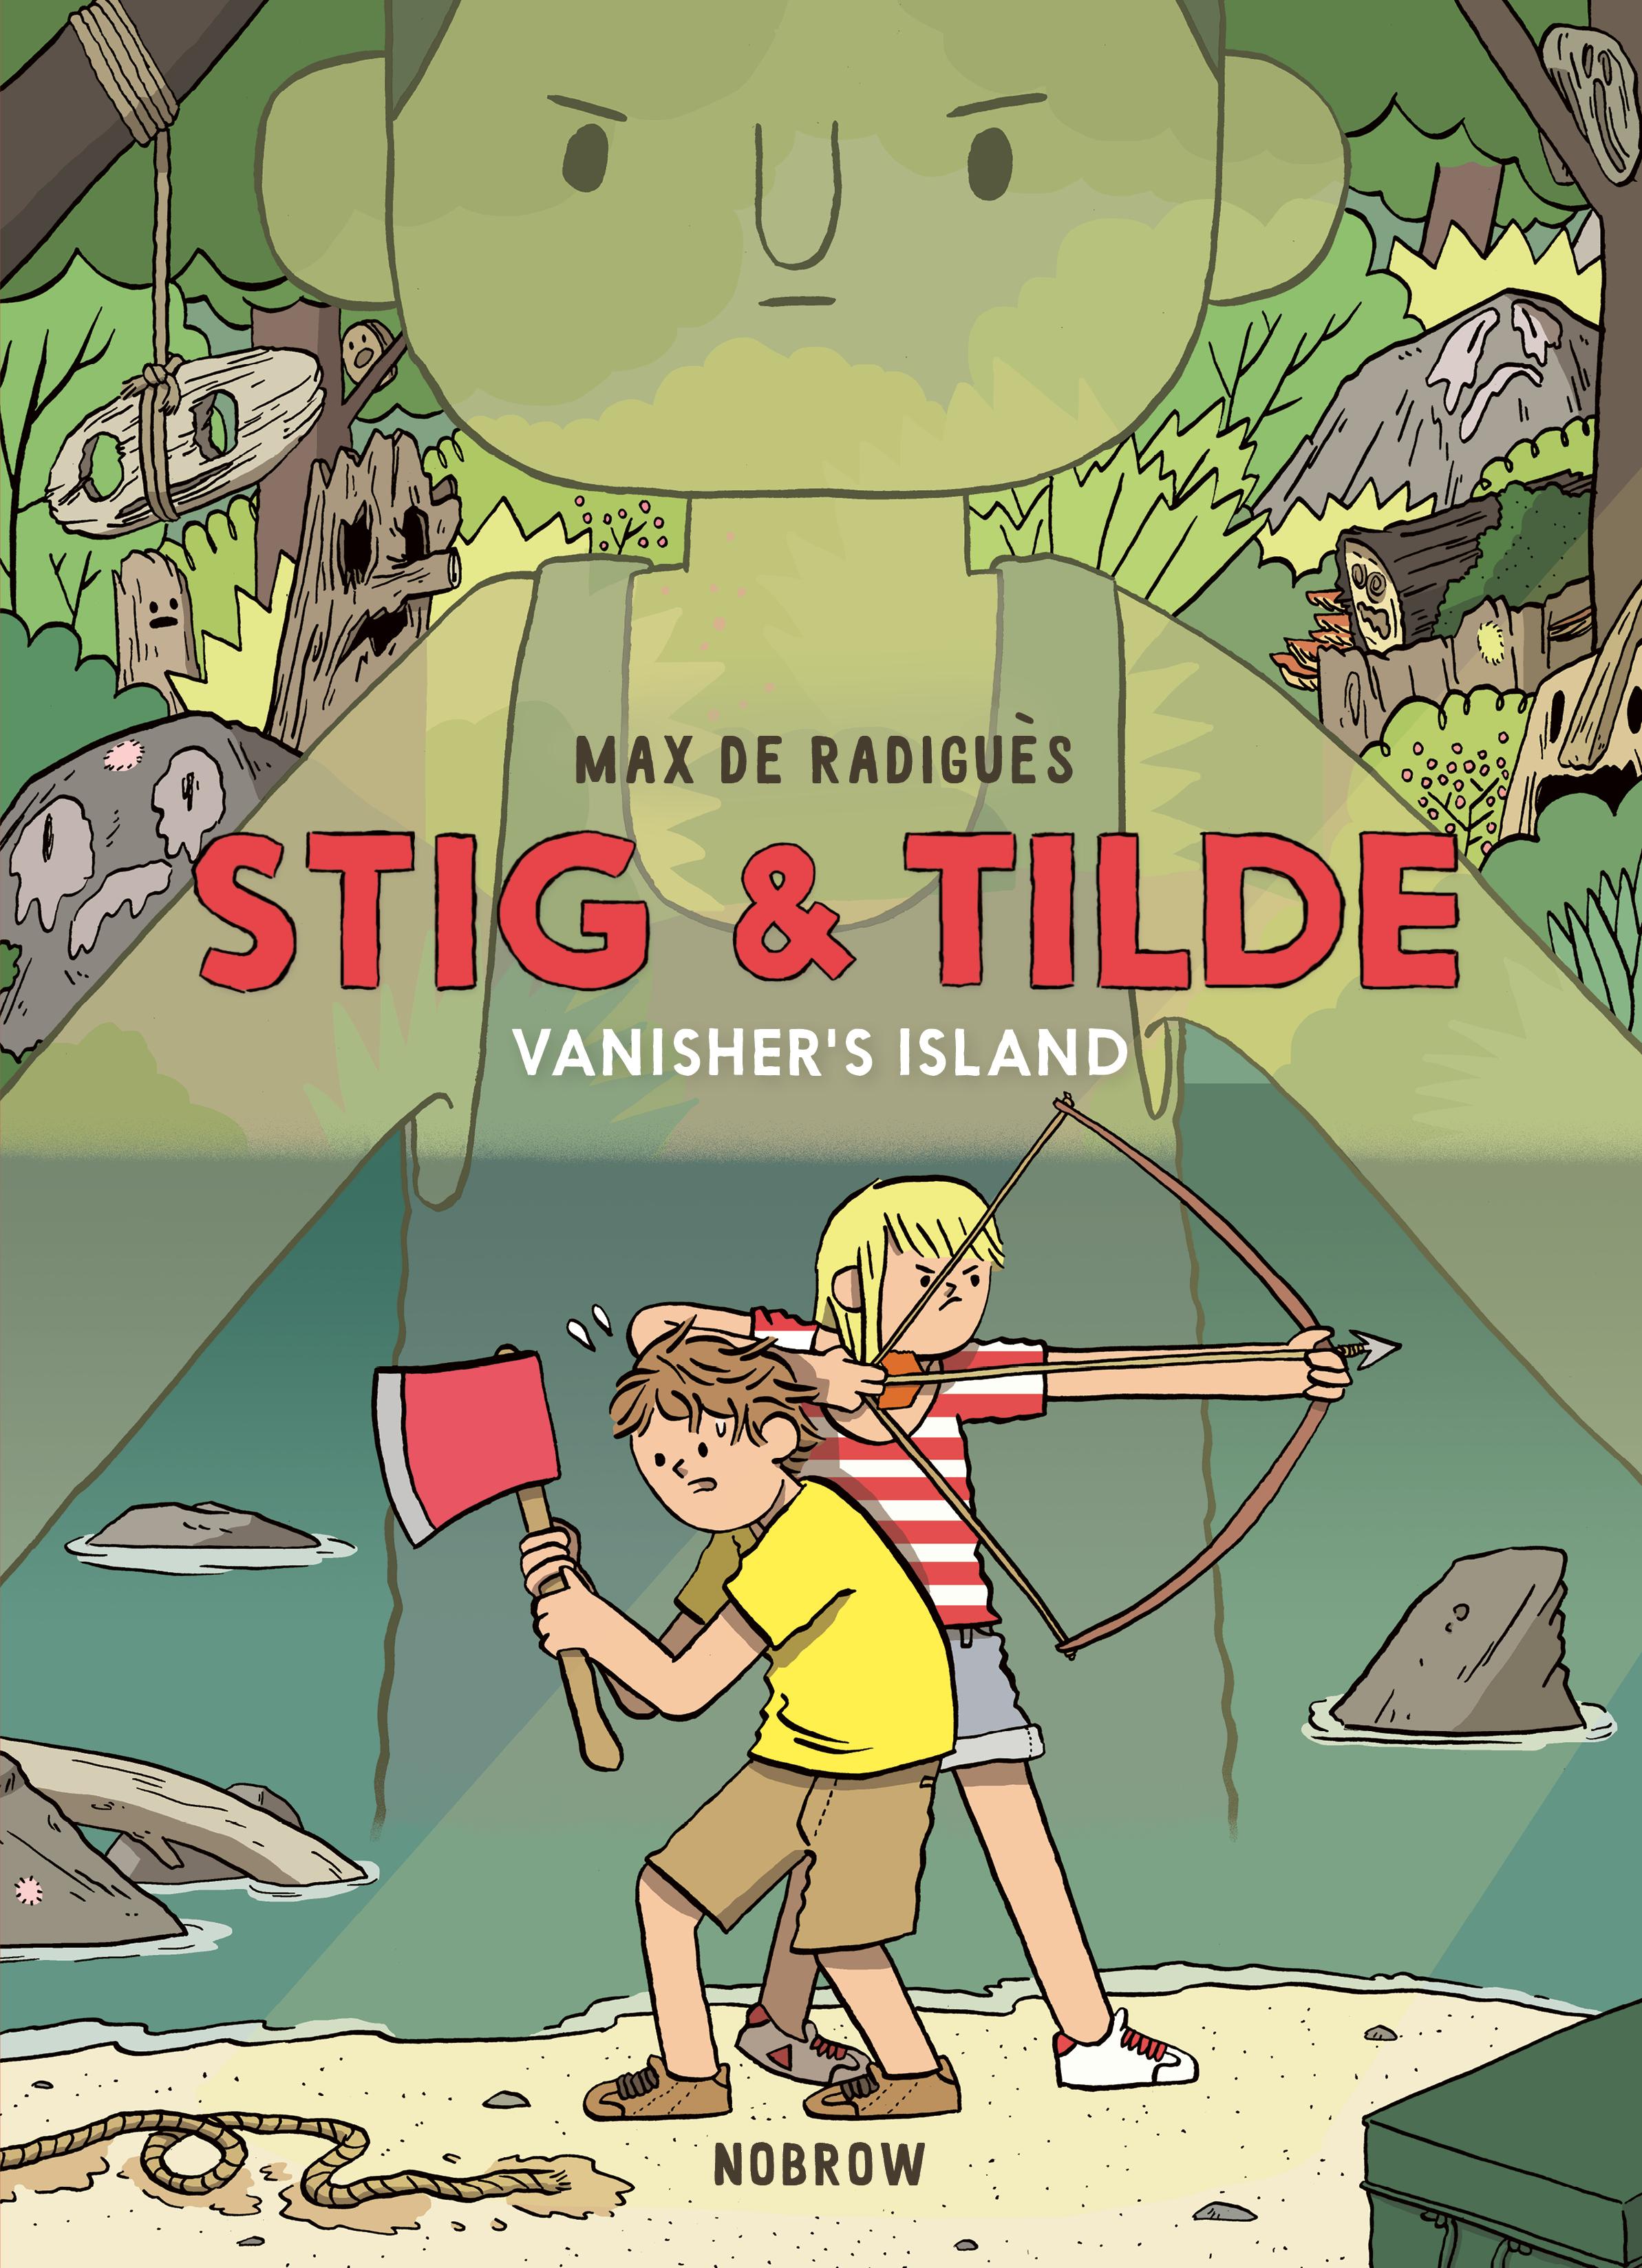 Stig and Tilde: Vanisher's Island